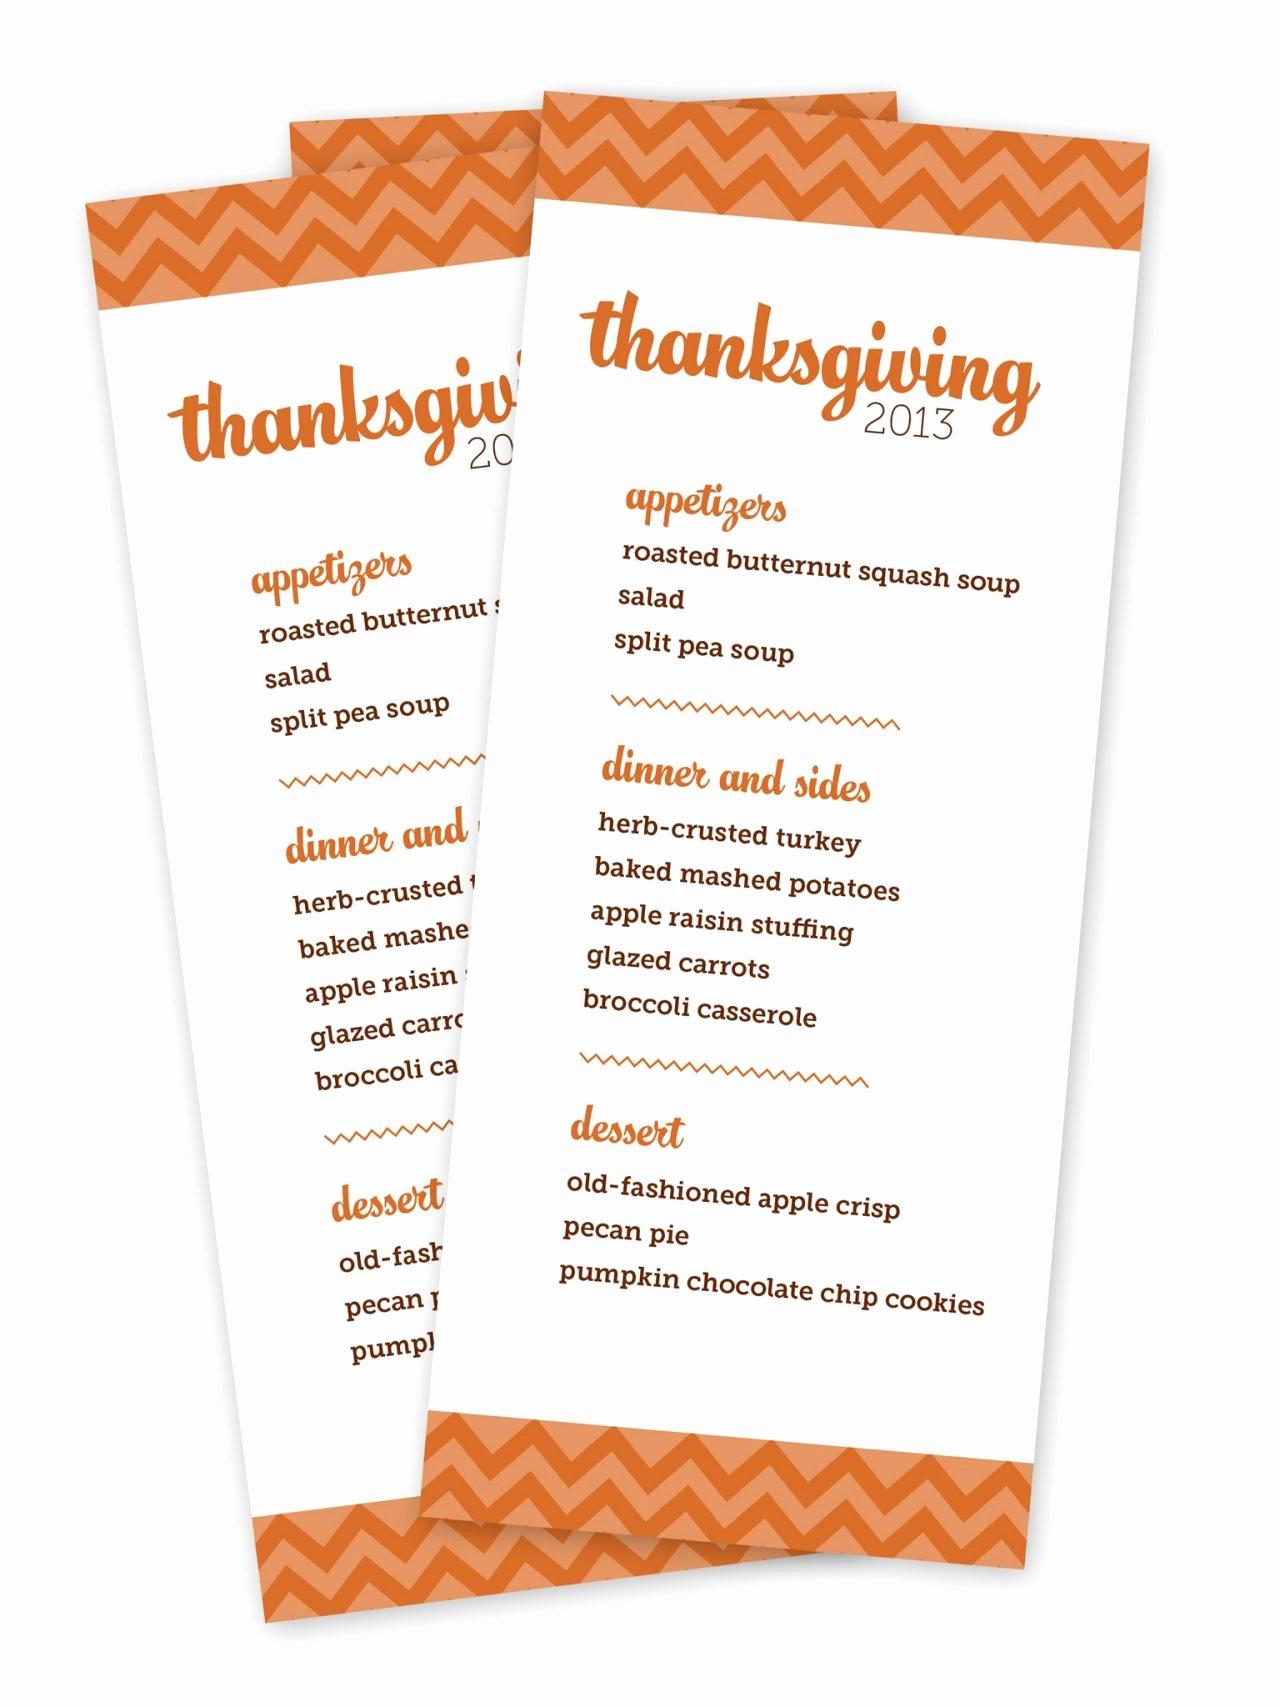 Printable Thanksgiving Menu Templates for Free – Happy